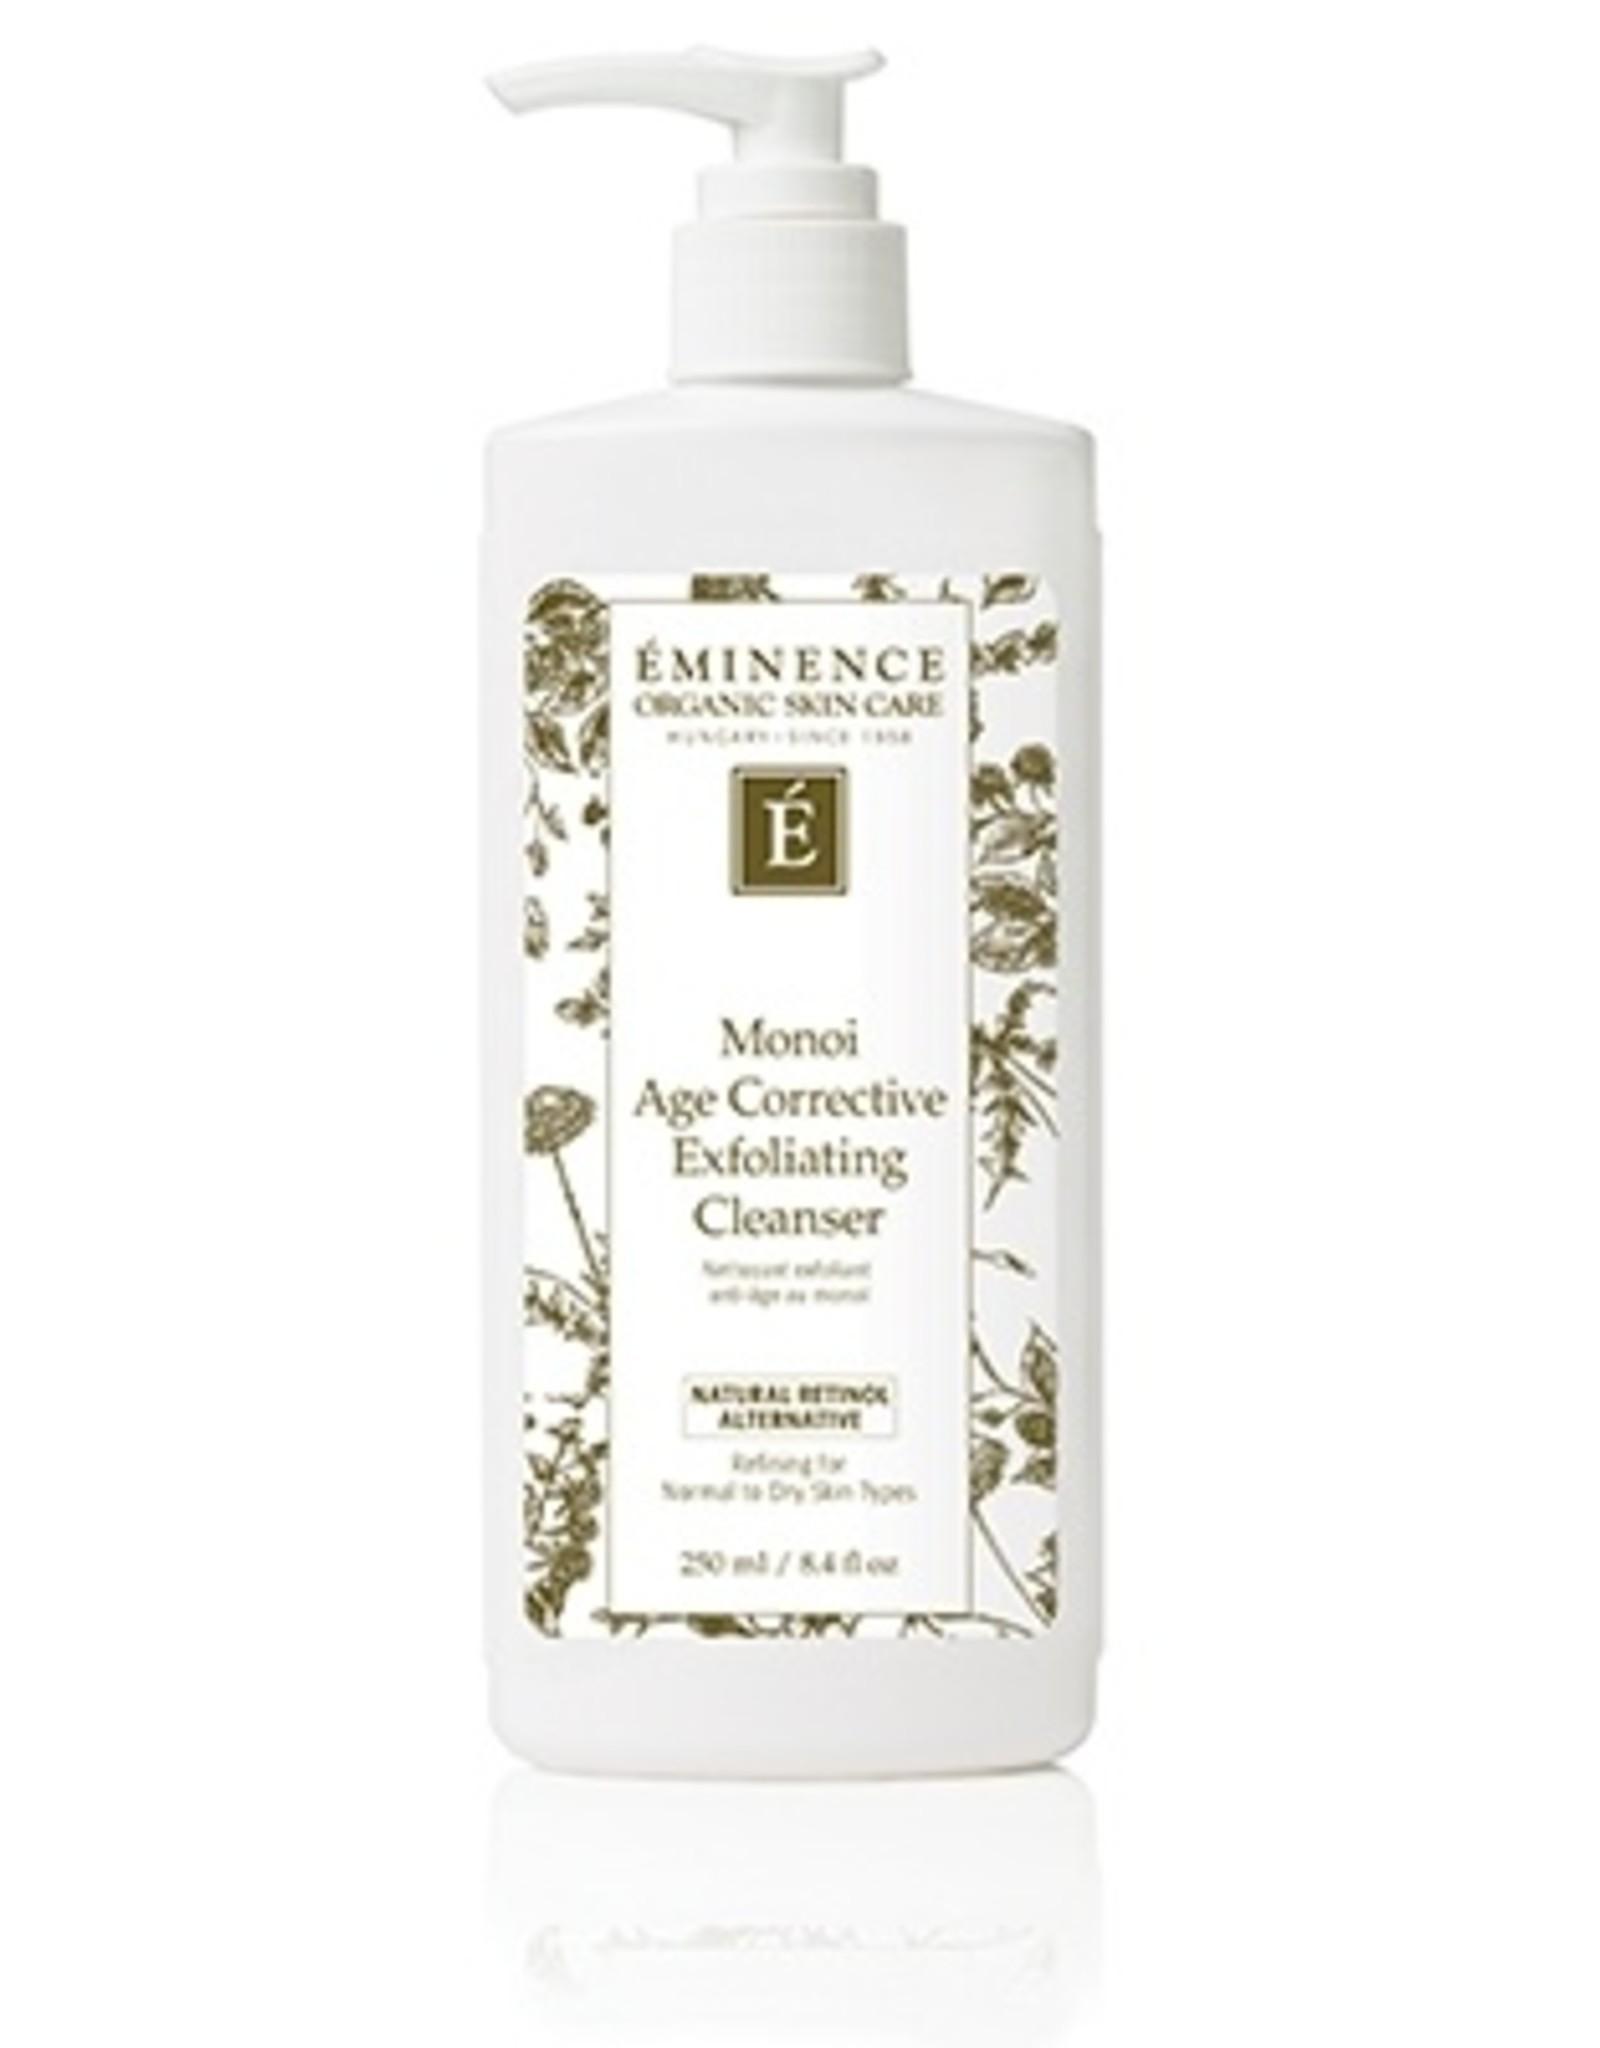 Eminence Organic Skin Care Monoi Age Corrective Exfoliating Cleanser